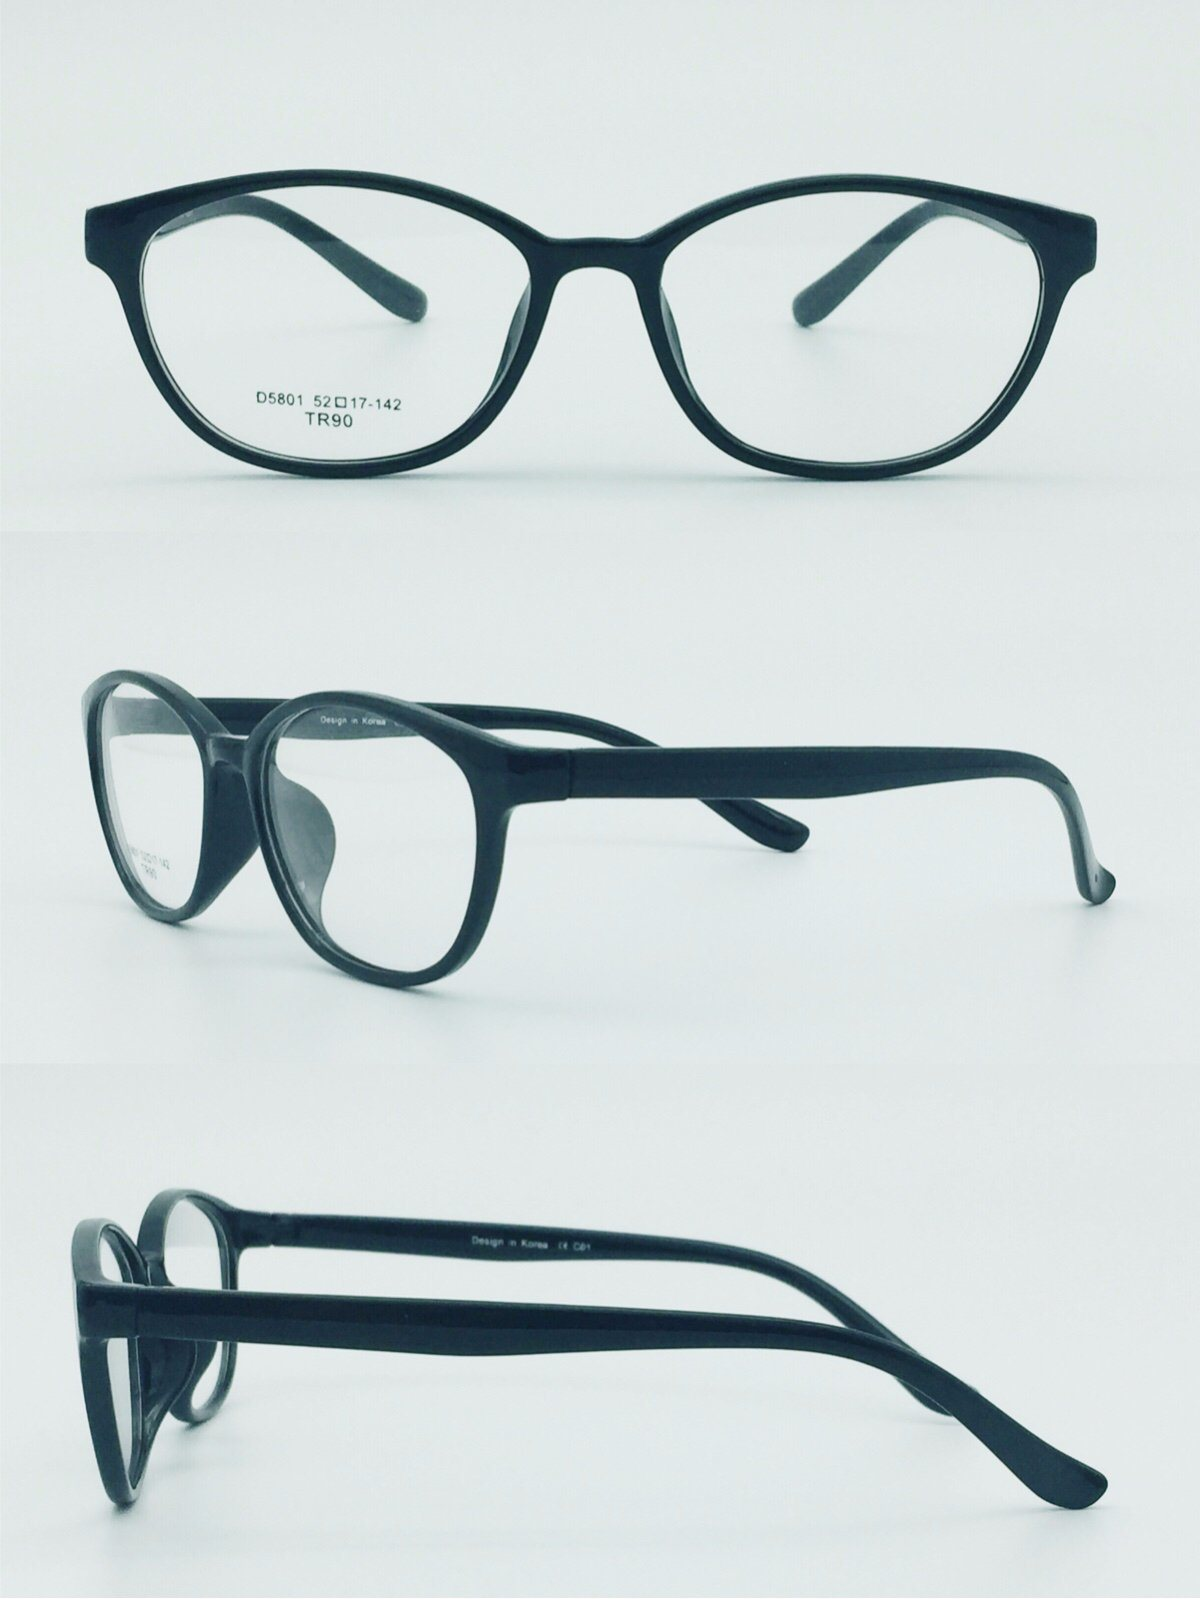 China Hot Sell New Design Tr90 Optical Frames Eyewear Eyeglasses ...